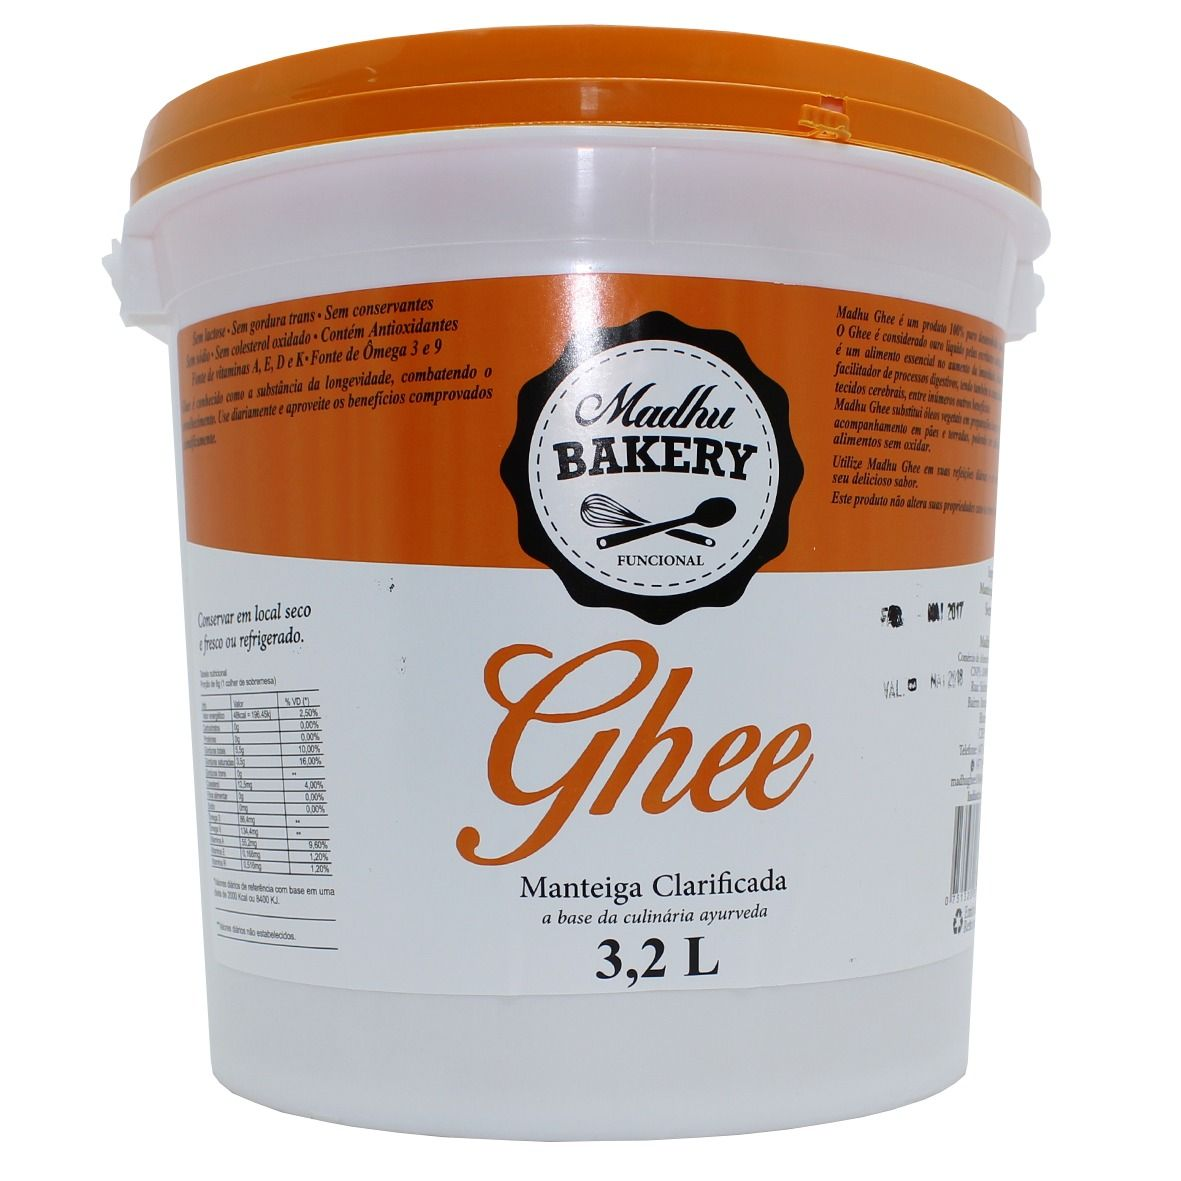 Kit 2 Baldes Manteiga Ghee 3,2L Cada - Madhu Bakery original